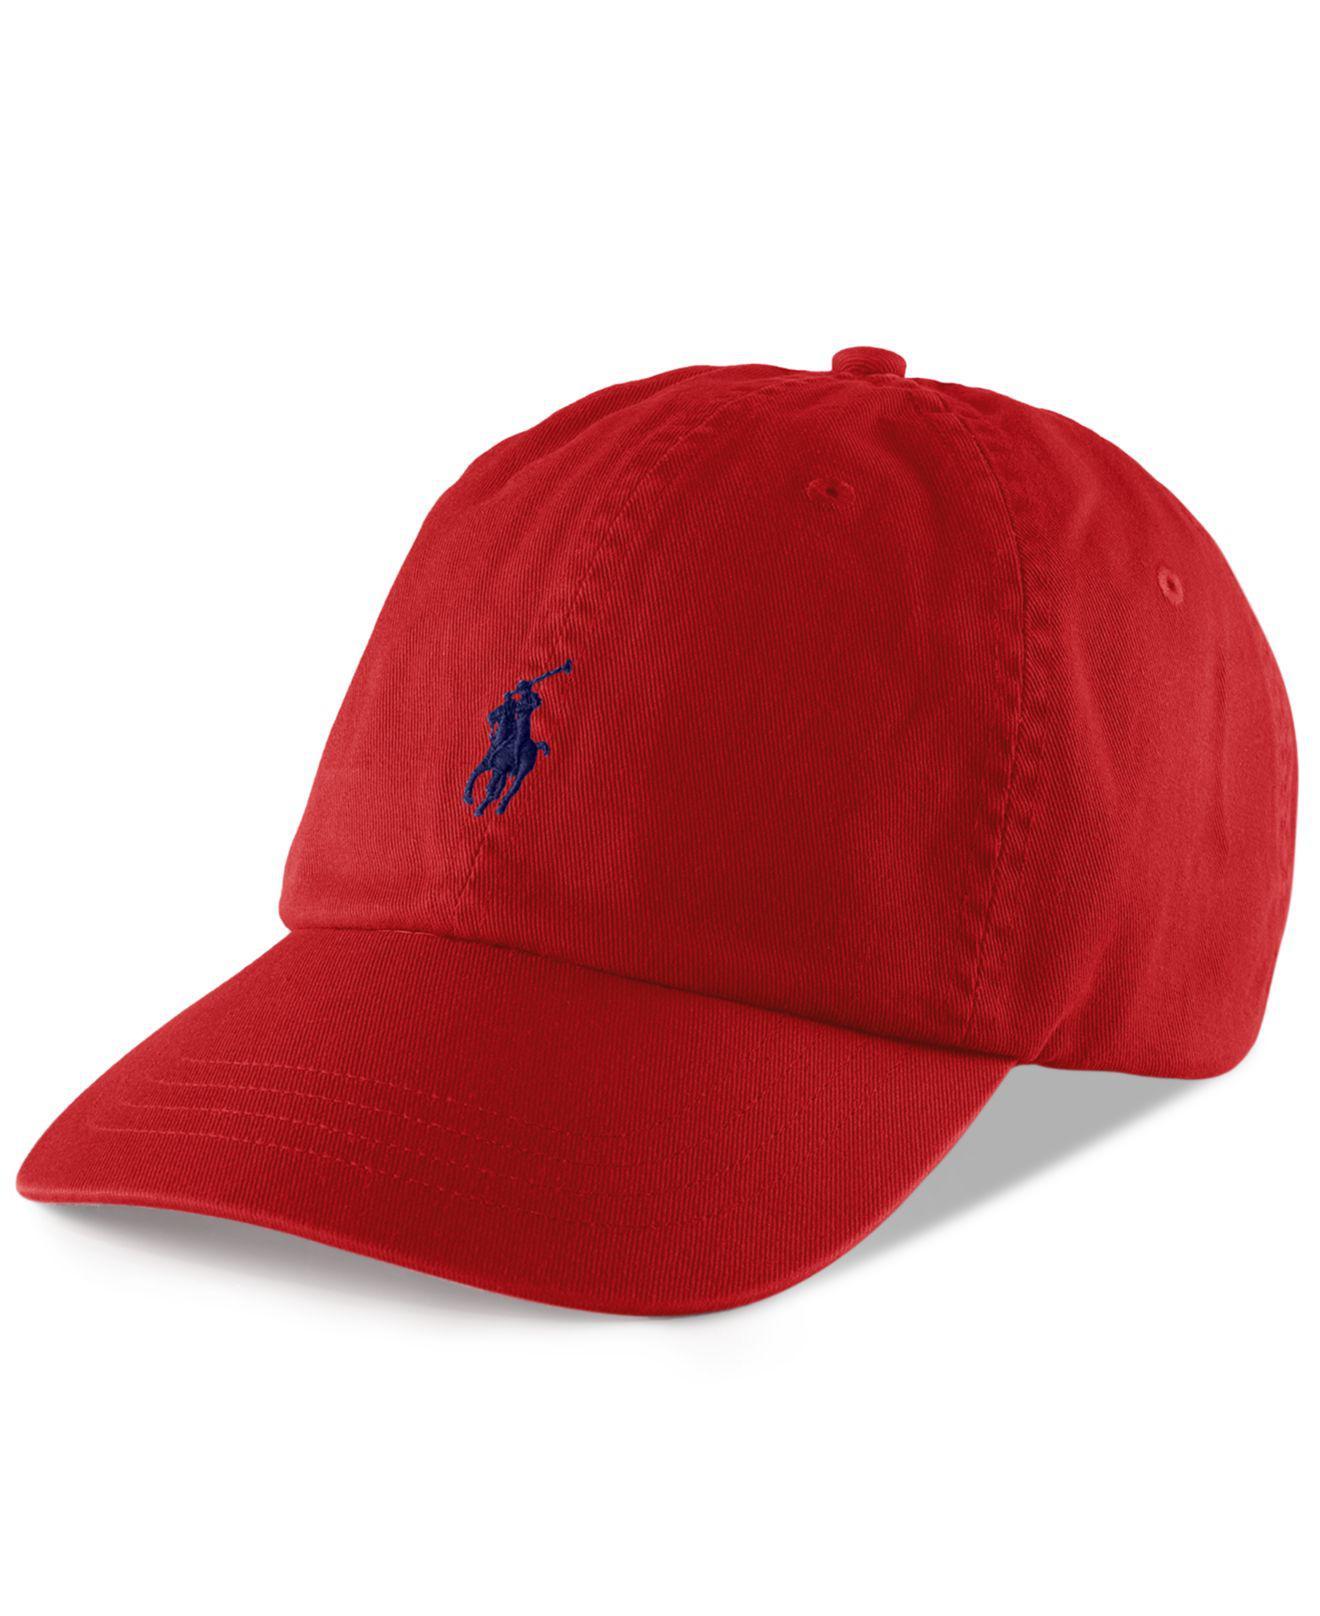 7cda8770b0d Lyst - Polo Ralph Lauren Classic Sport Cap in Red for Men - Save 21%